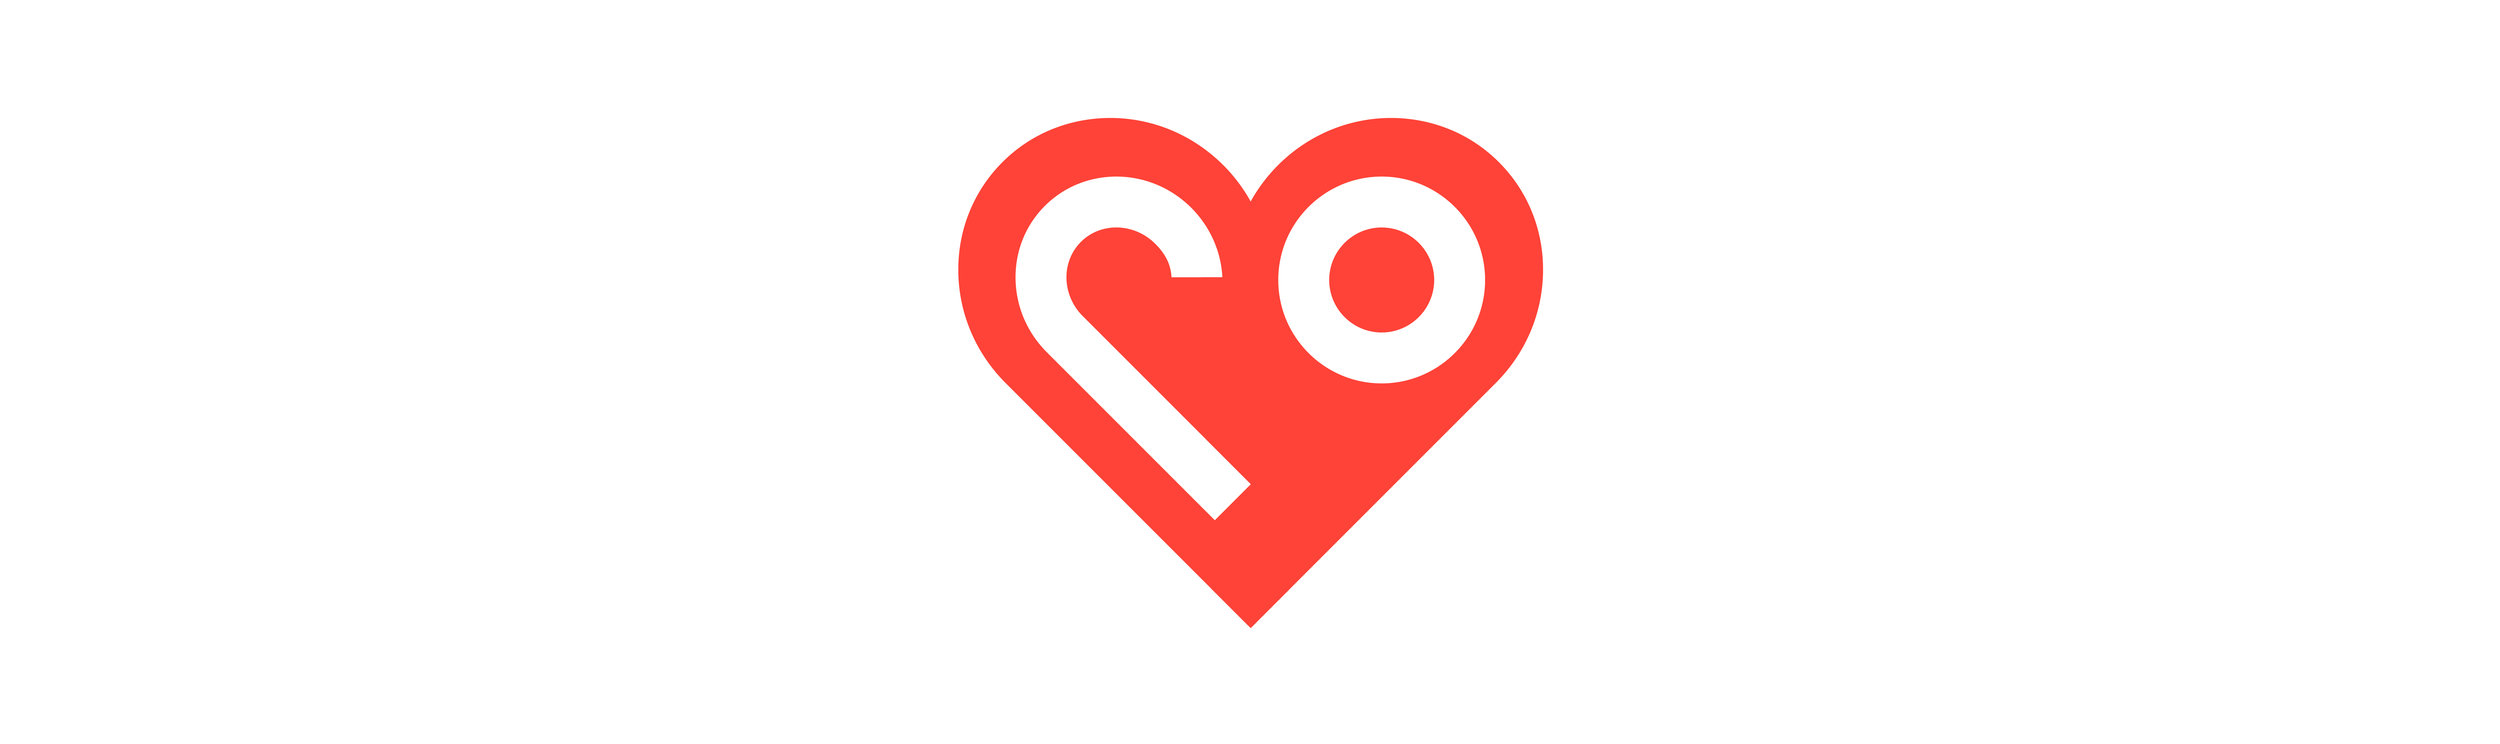 Love The Sign.Design Love Is Korea